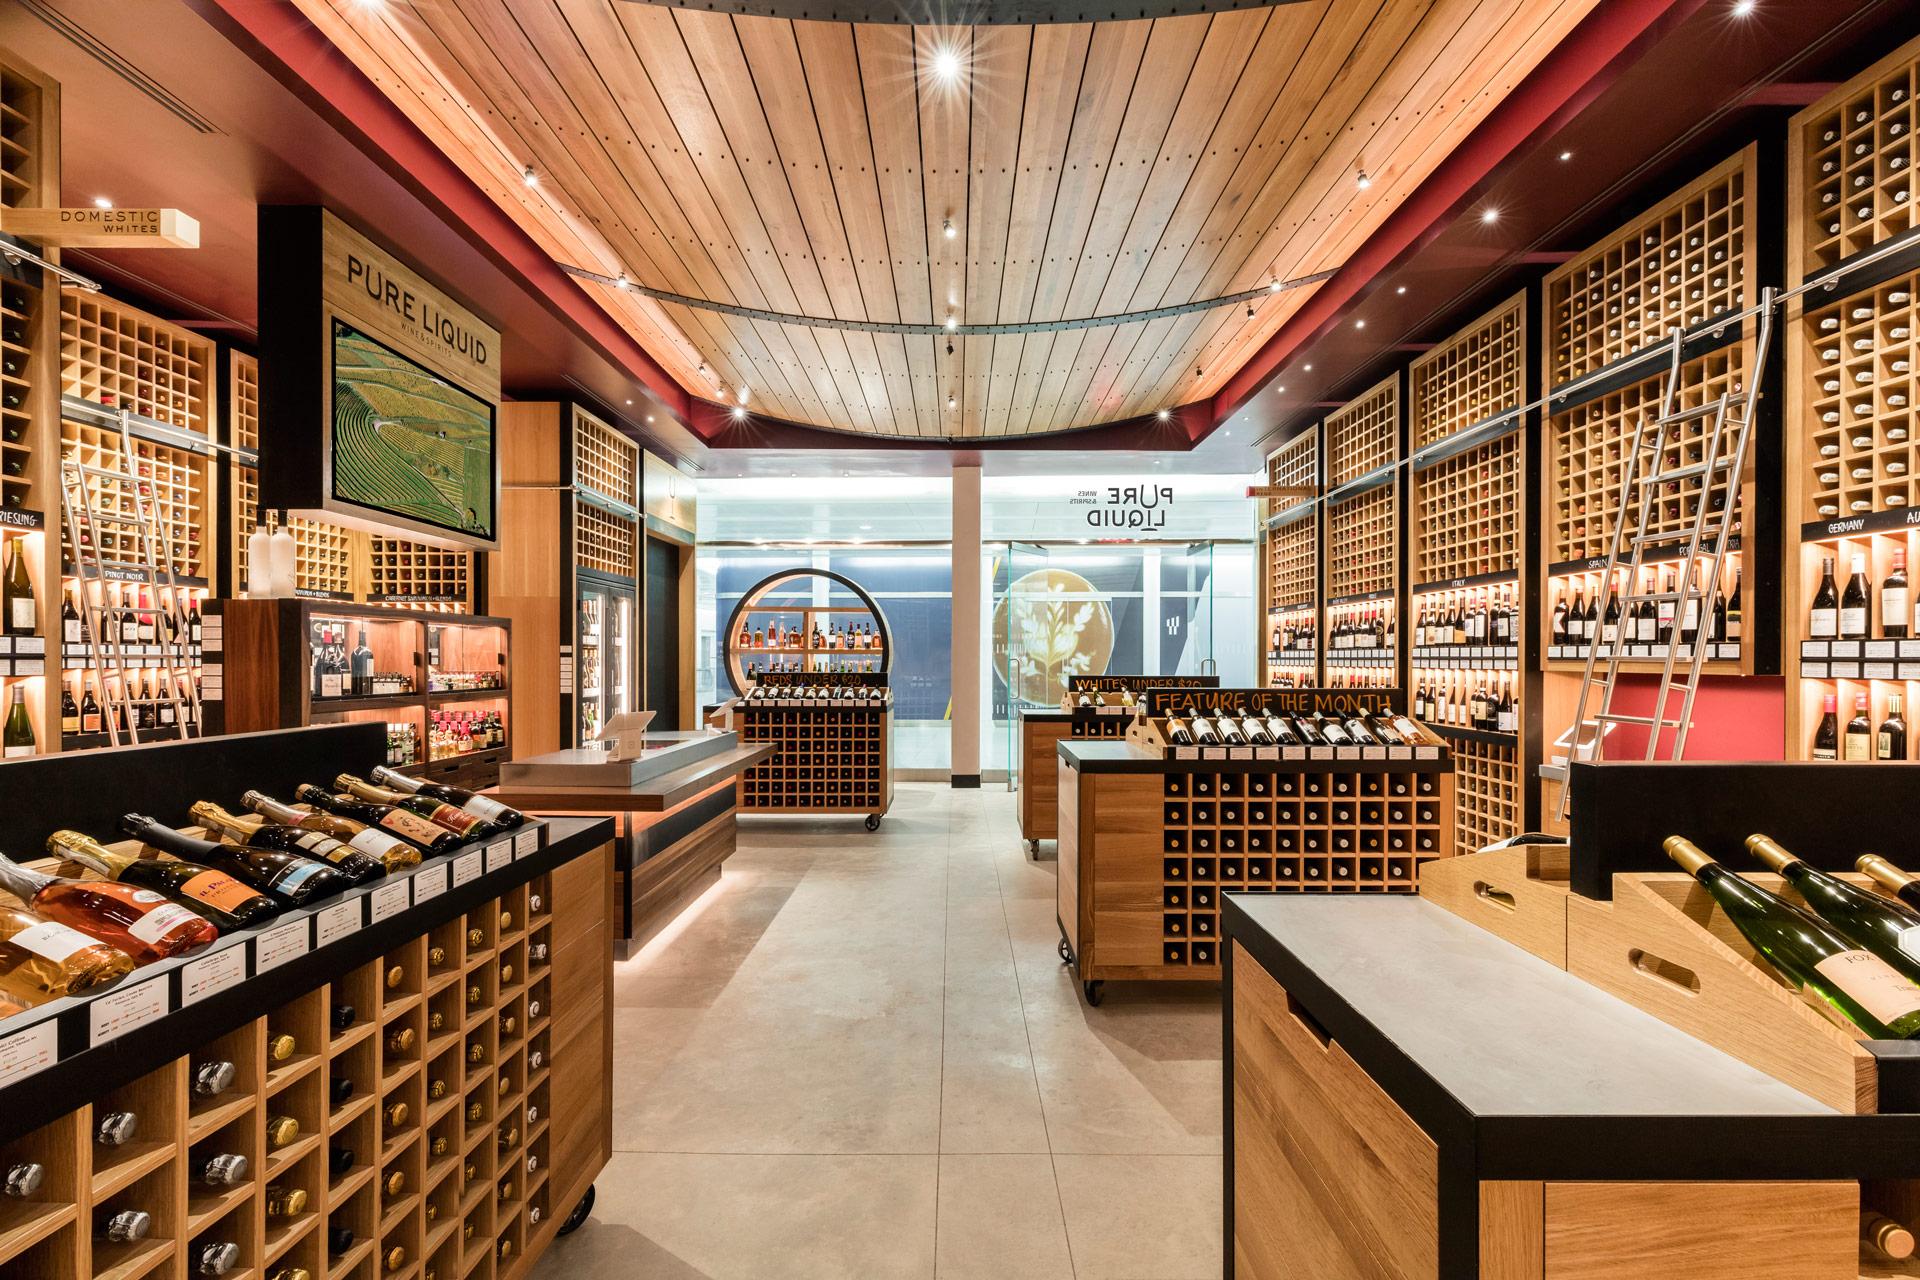 Pure Liquid Wine & Spirits retail store design